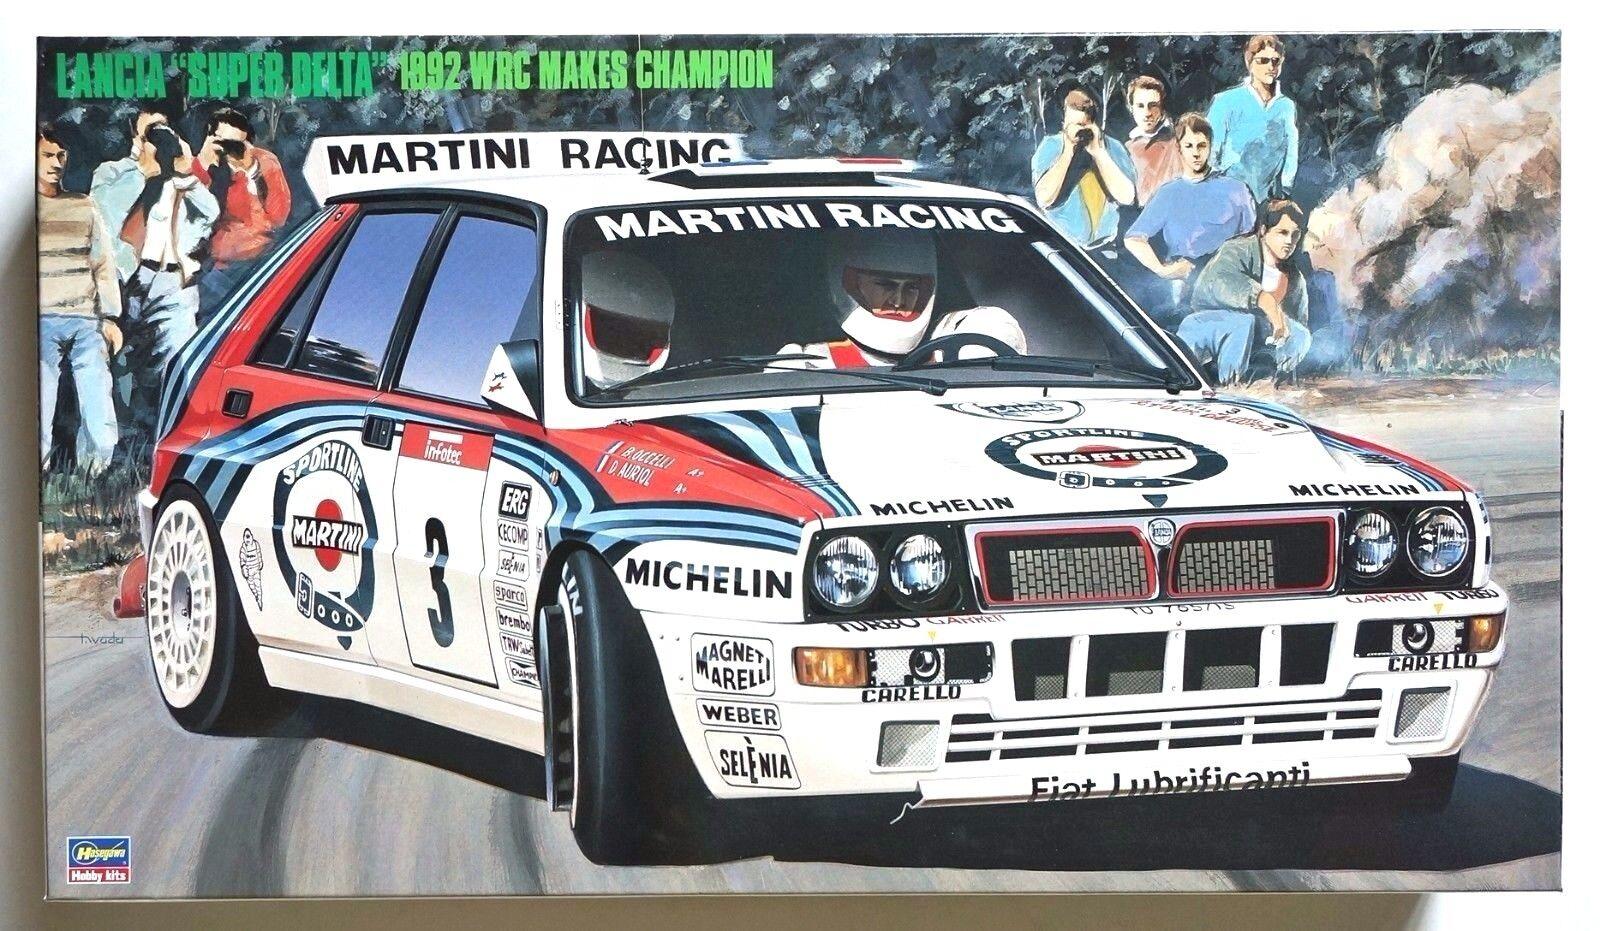 HASEGAWA 1 24 Lancia Super Delta 1992 WRC makes champion scale model kit